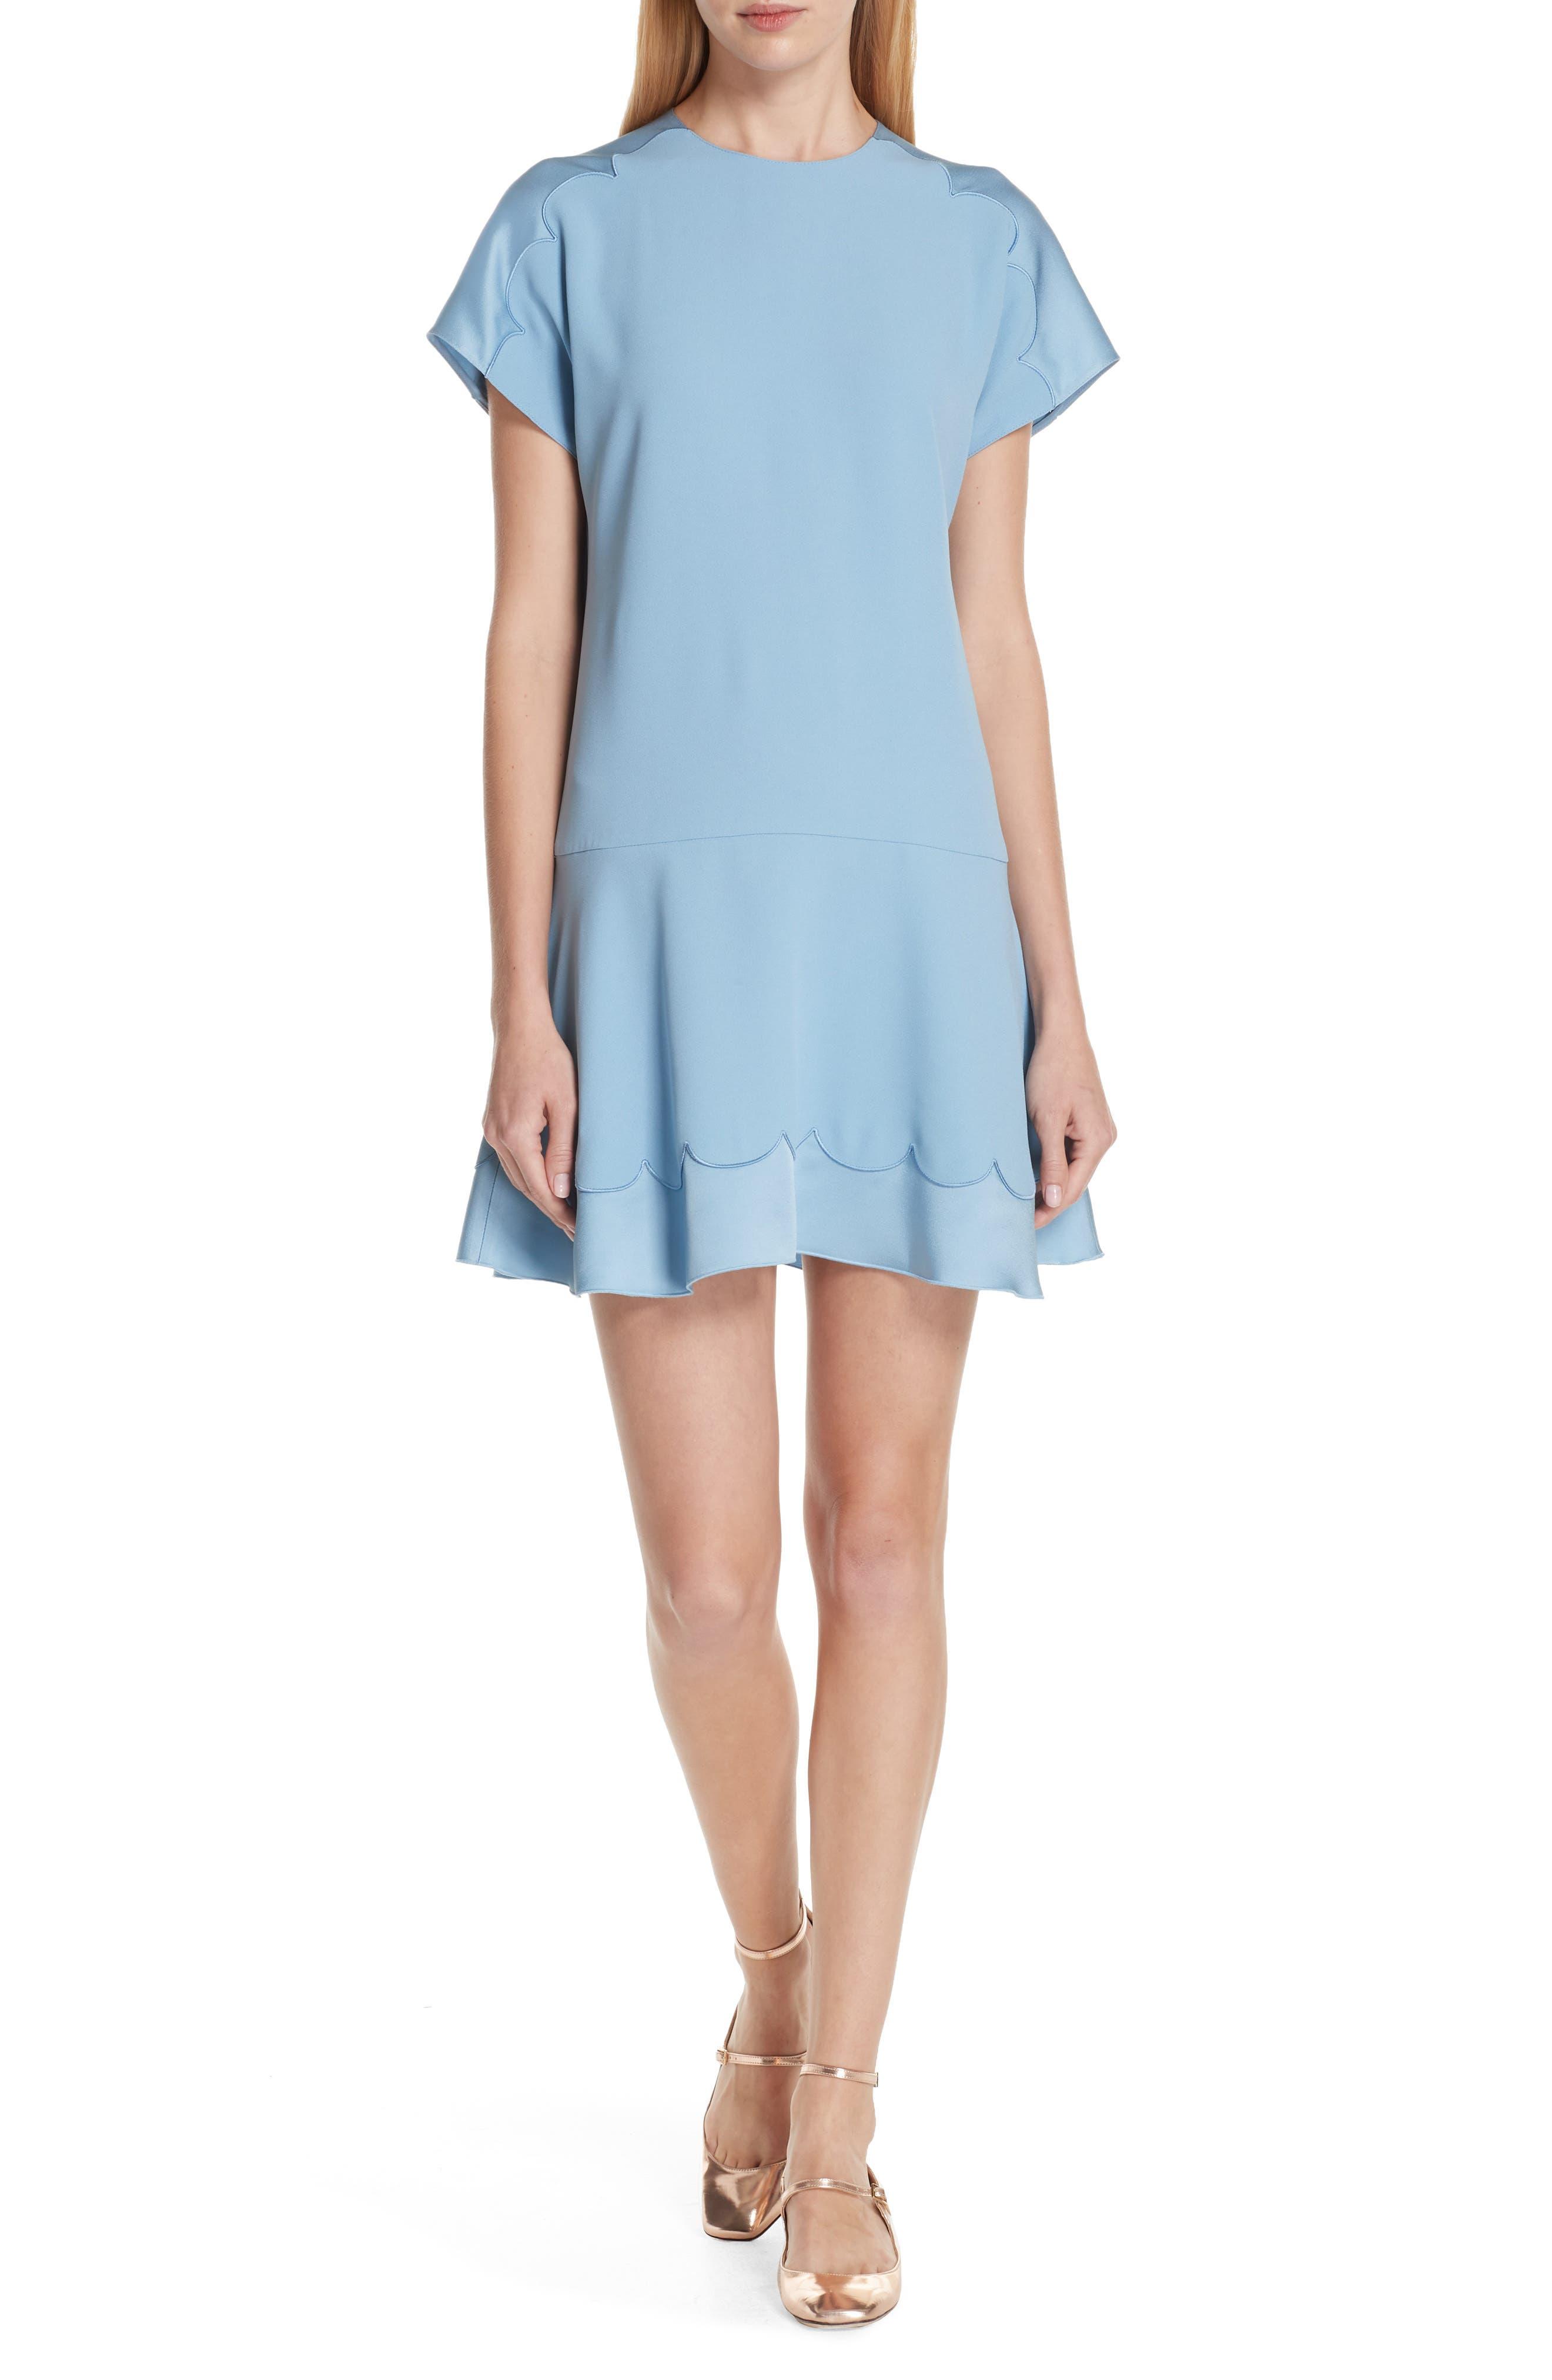 Scalloped Trim Mini Dress